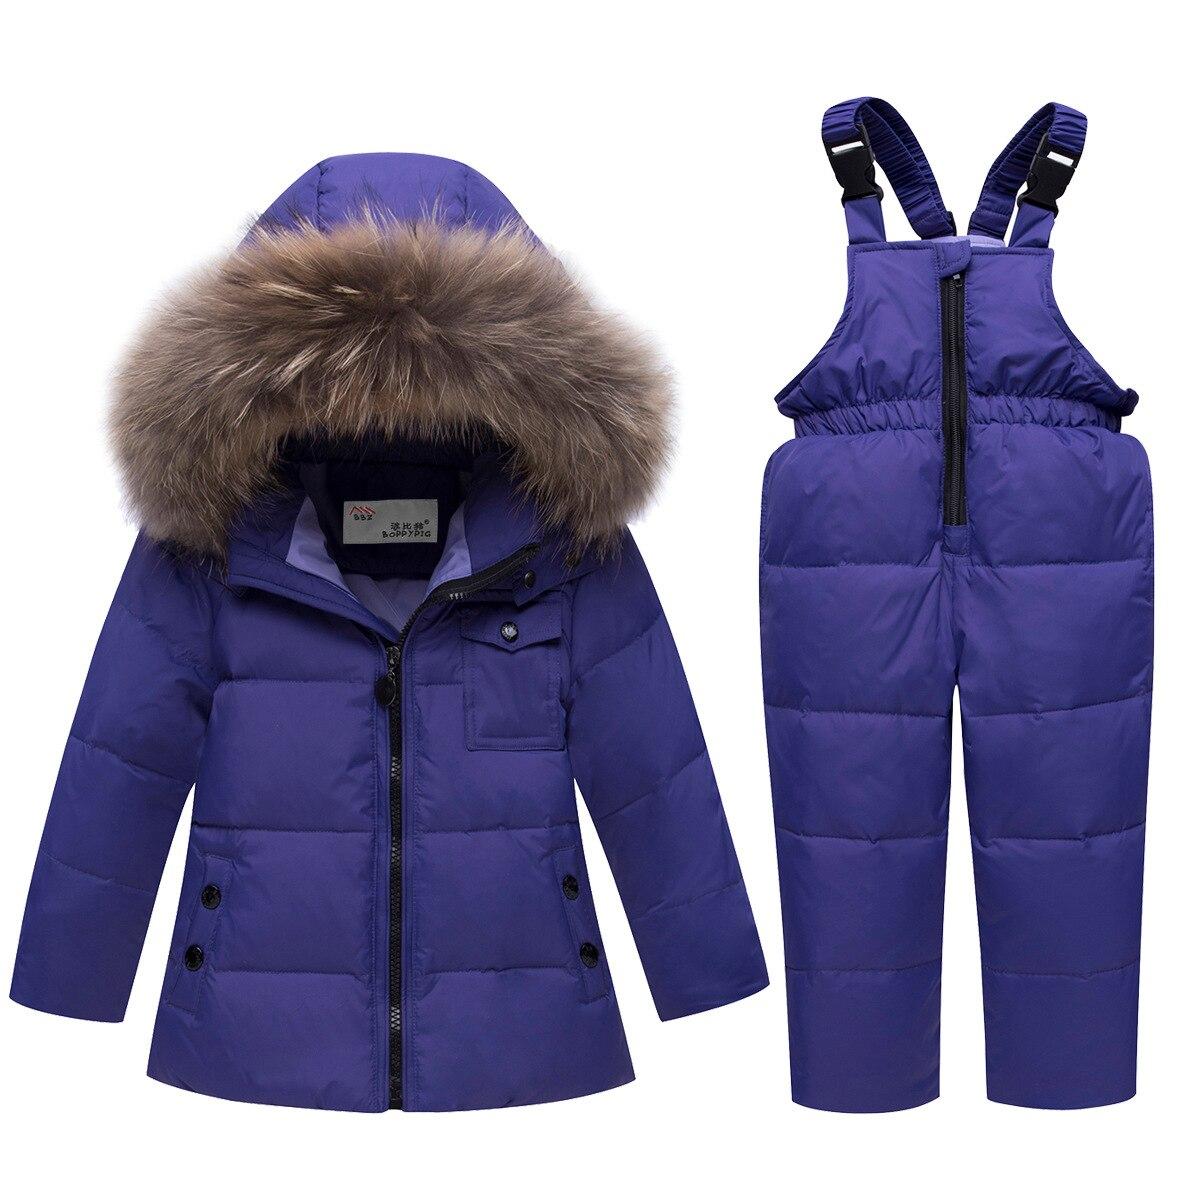 646a9e1f4a5b Raise Young -30 Degree Winter children Boy Clothes set Warm Down ...